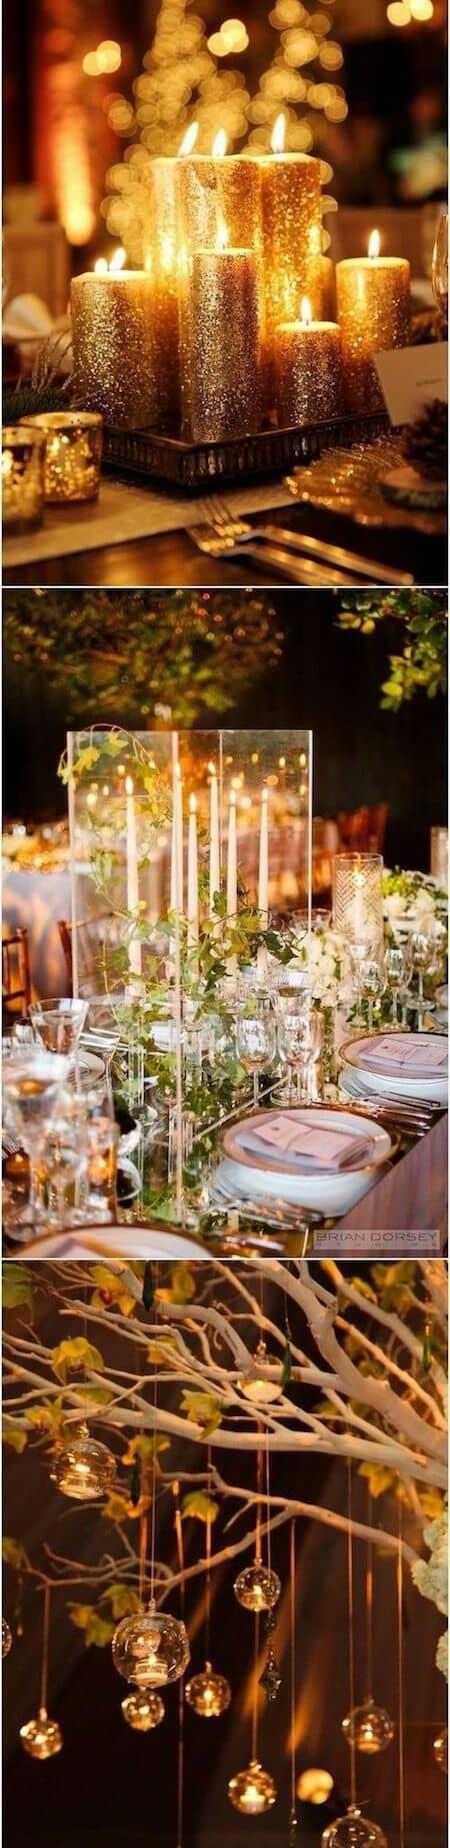 28 amazing wedding reception lighting ideas you can steal candle lighting ideas for your wedding junglespirit Gallery